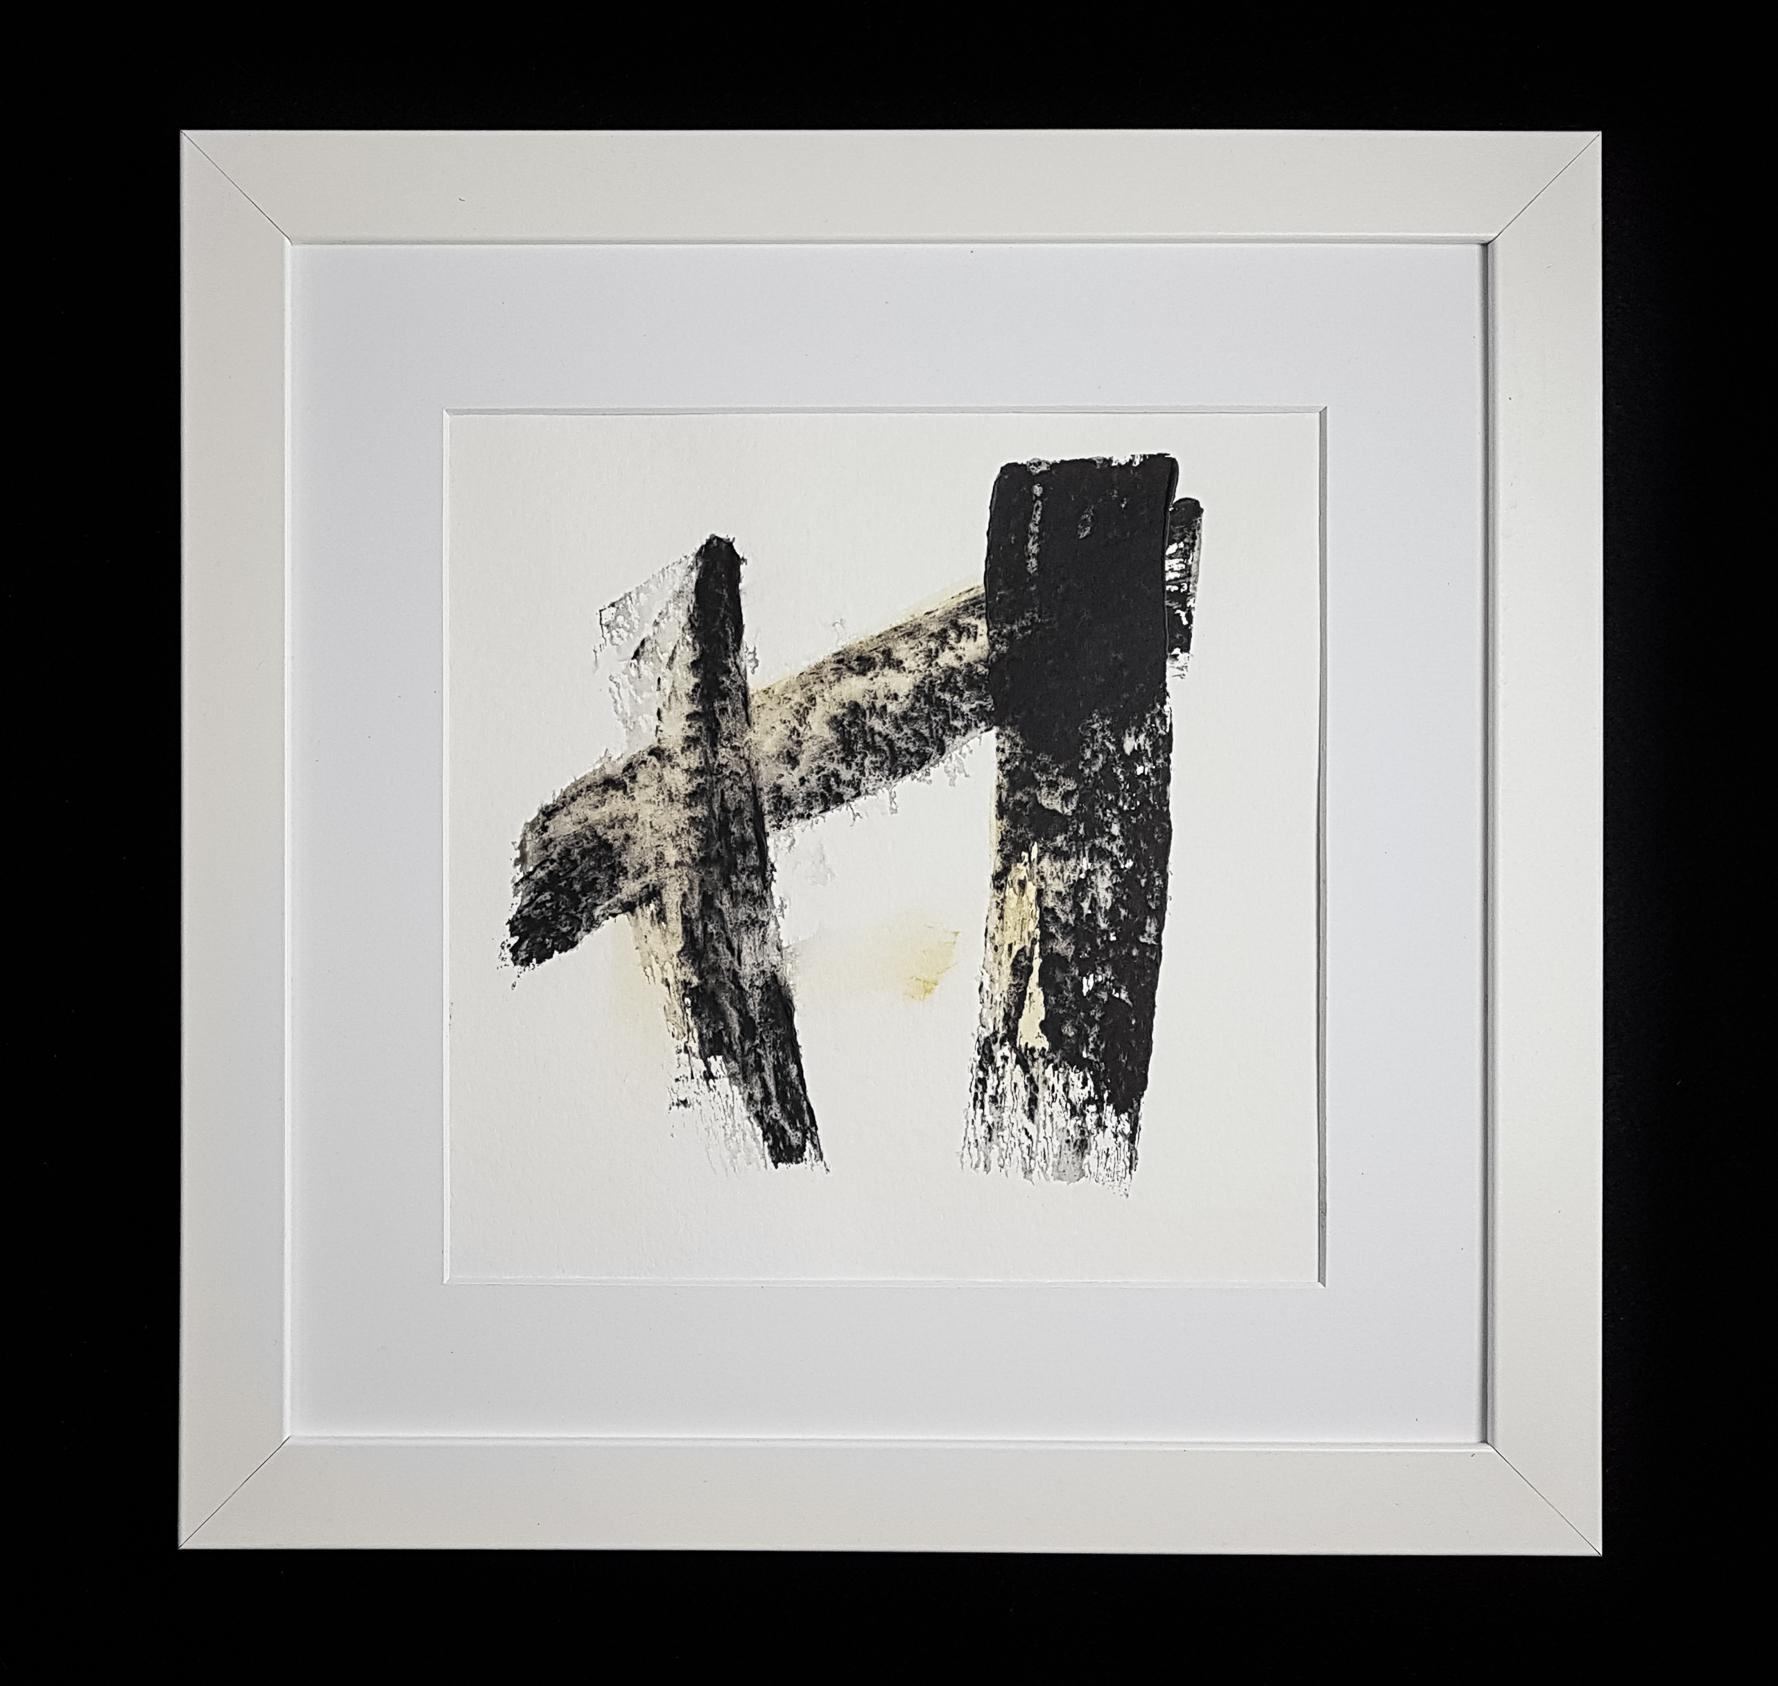 Matthew G. Beall Asemic Squared 25 x 25 cm 2017 (1)